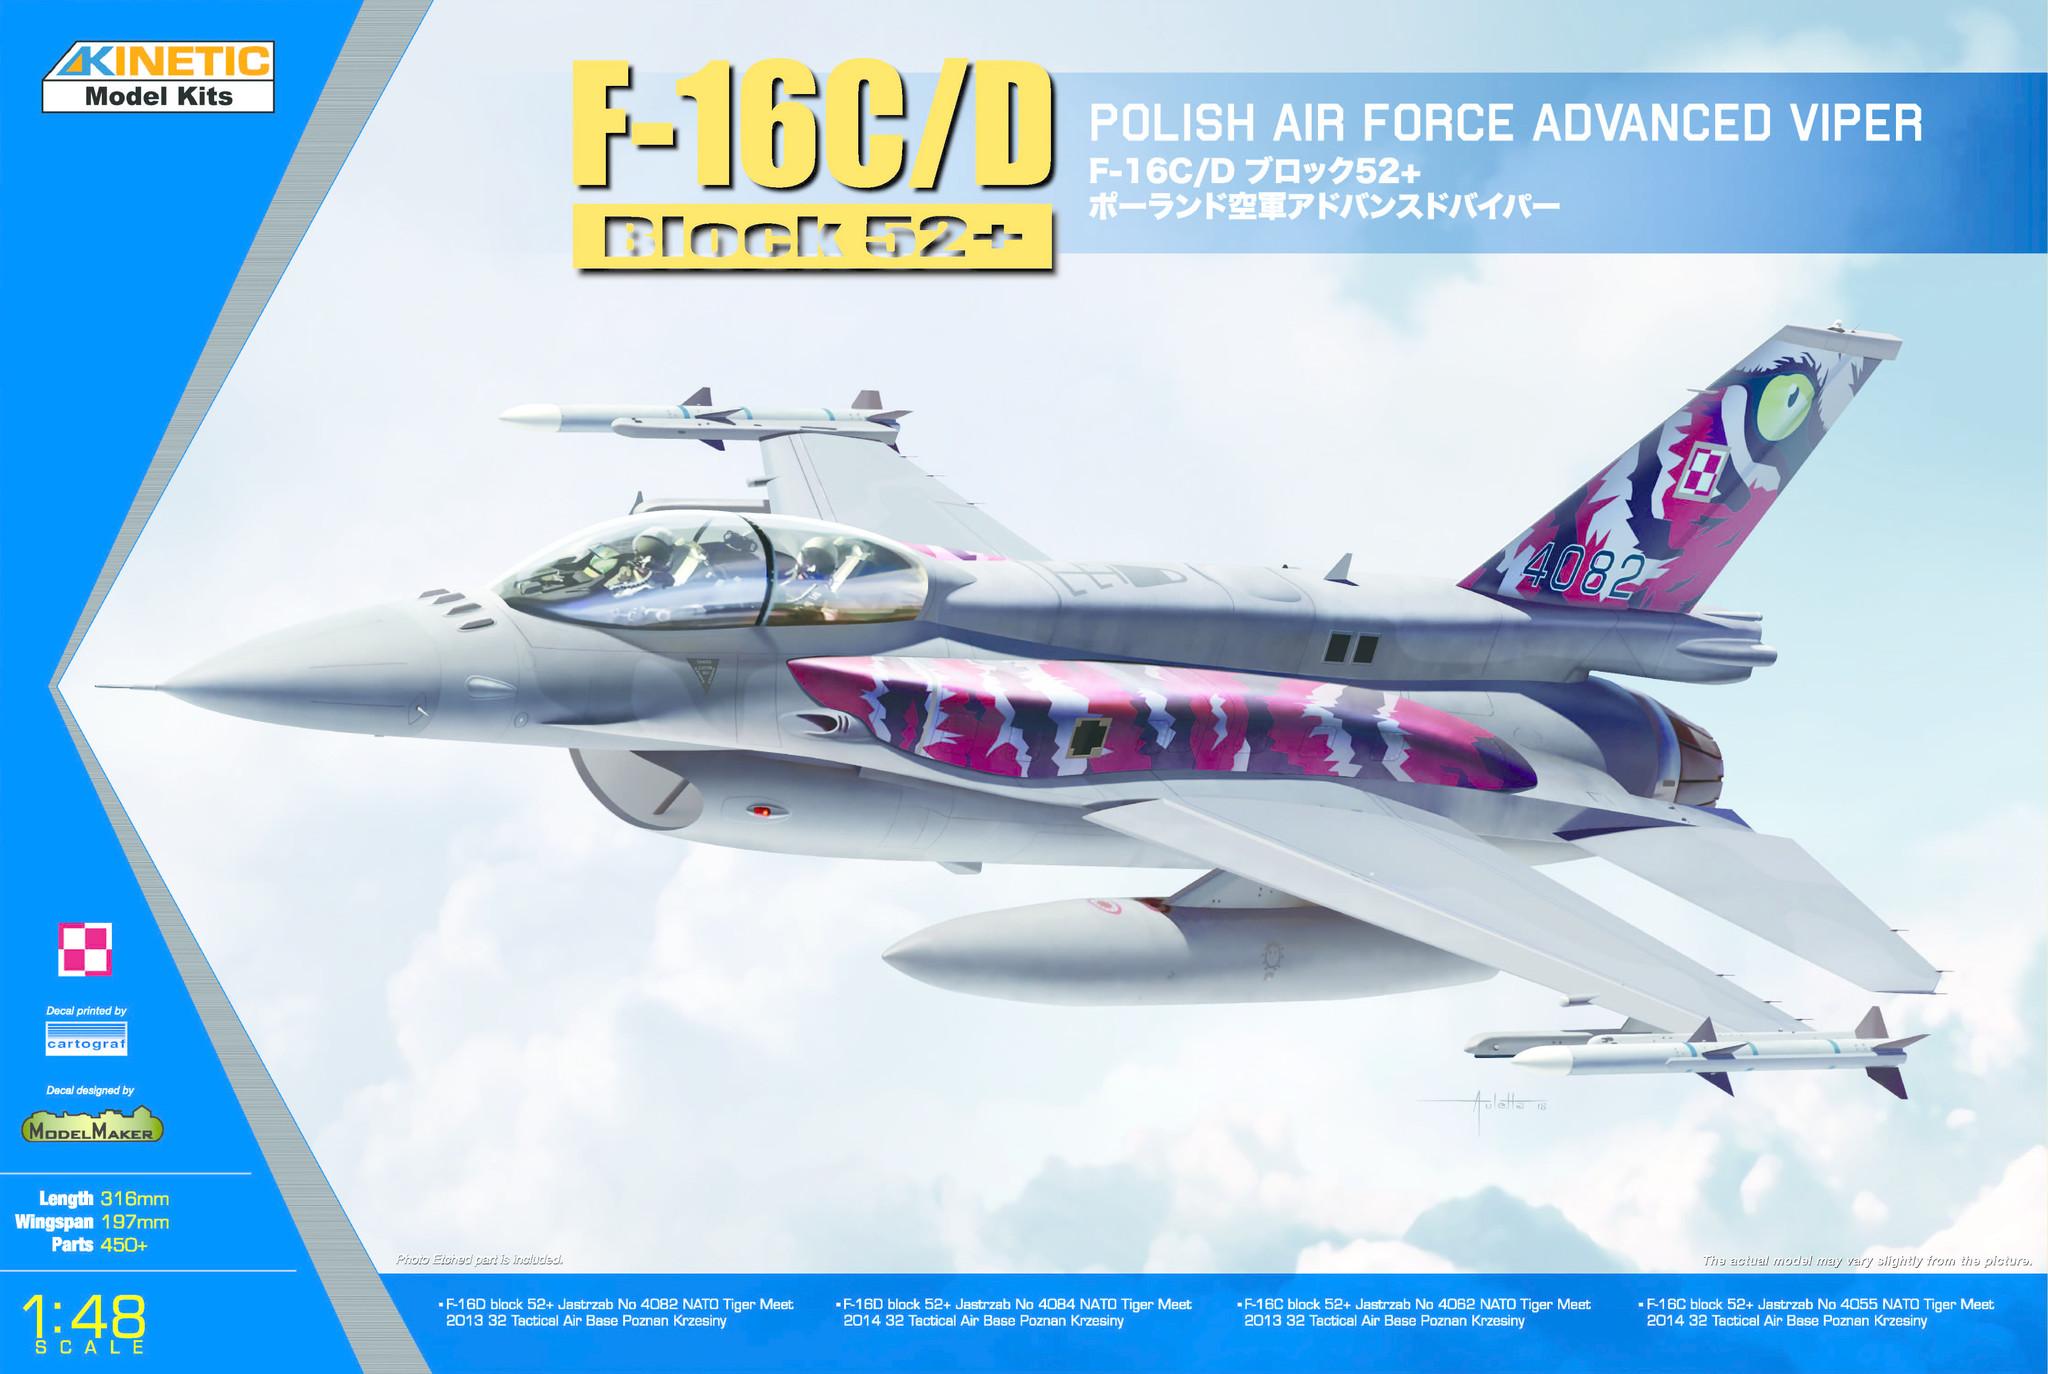 Kinetic F-16C/D Polish Tiger Meet 2013/2014 - Scale 1/48 - Kinetic - KIN48076